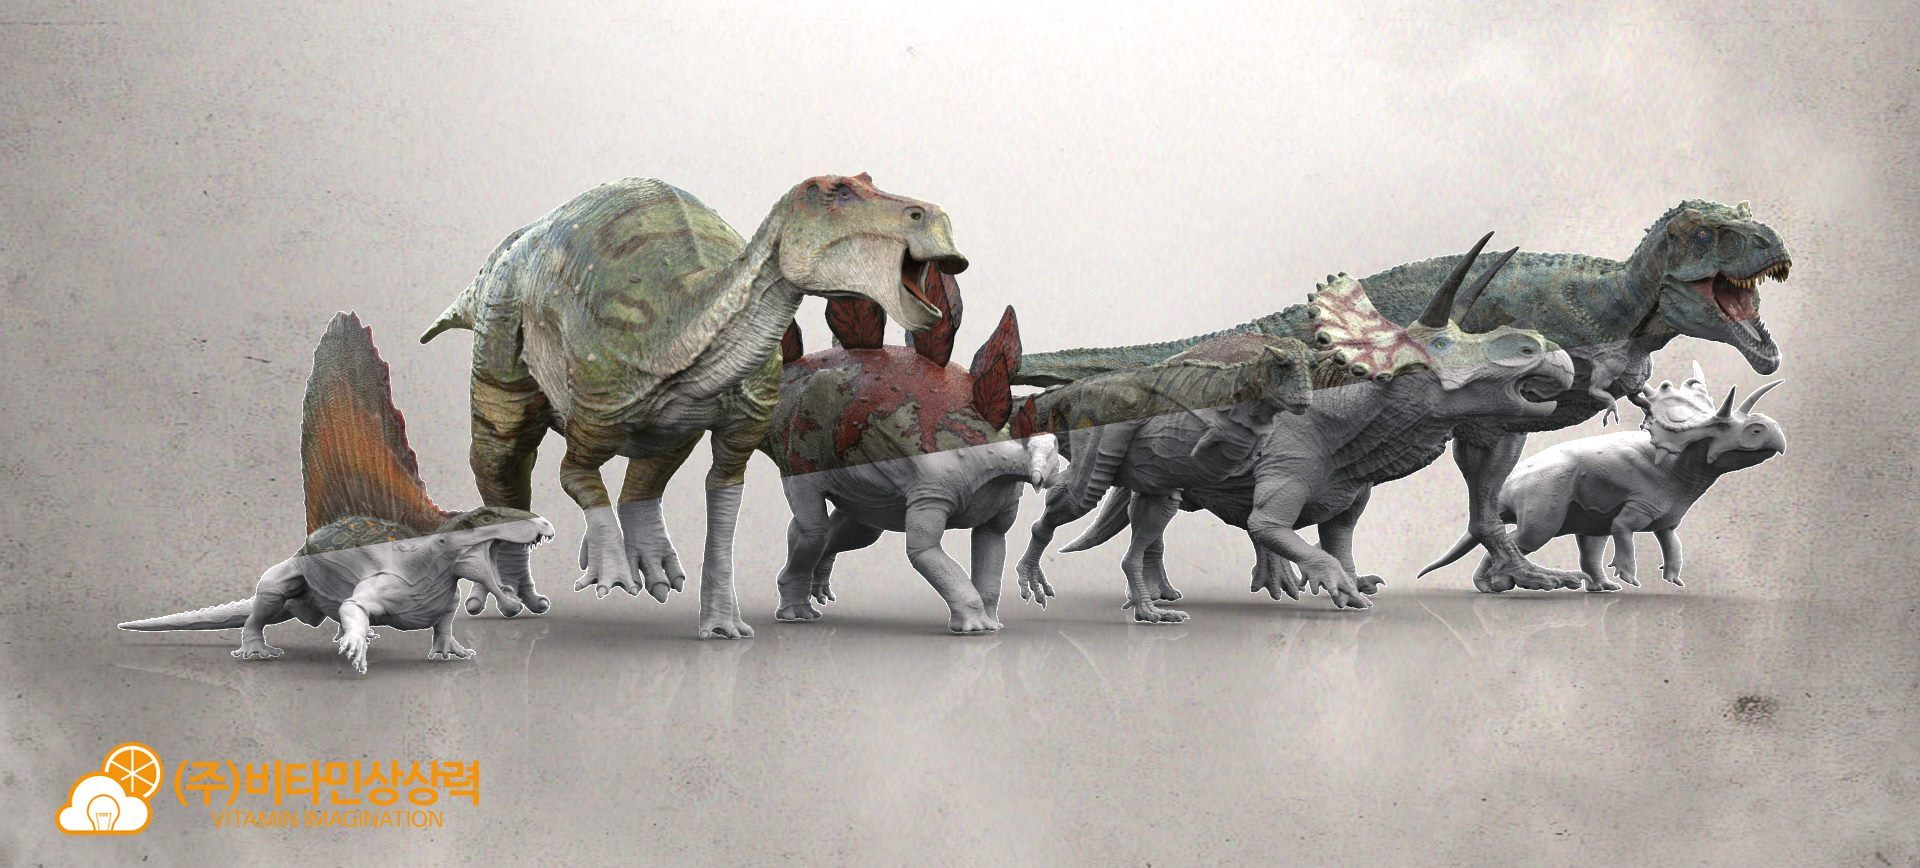 VITAMIN_IMAGINATION/비타민상상력/KONGTREK/공룡/dinosaur